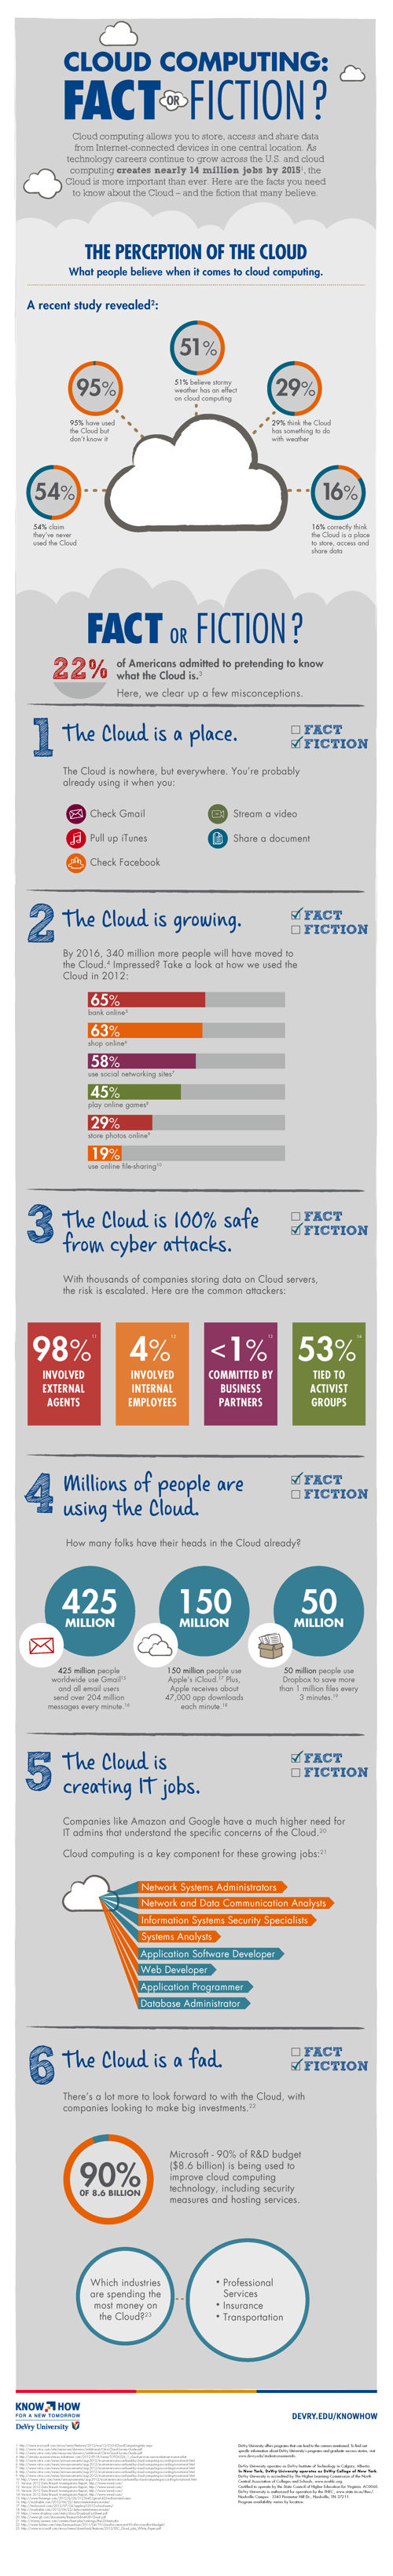 Cloud-Computing-Fact-Or-Fiction